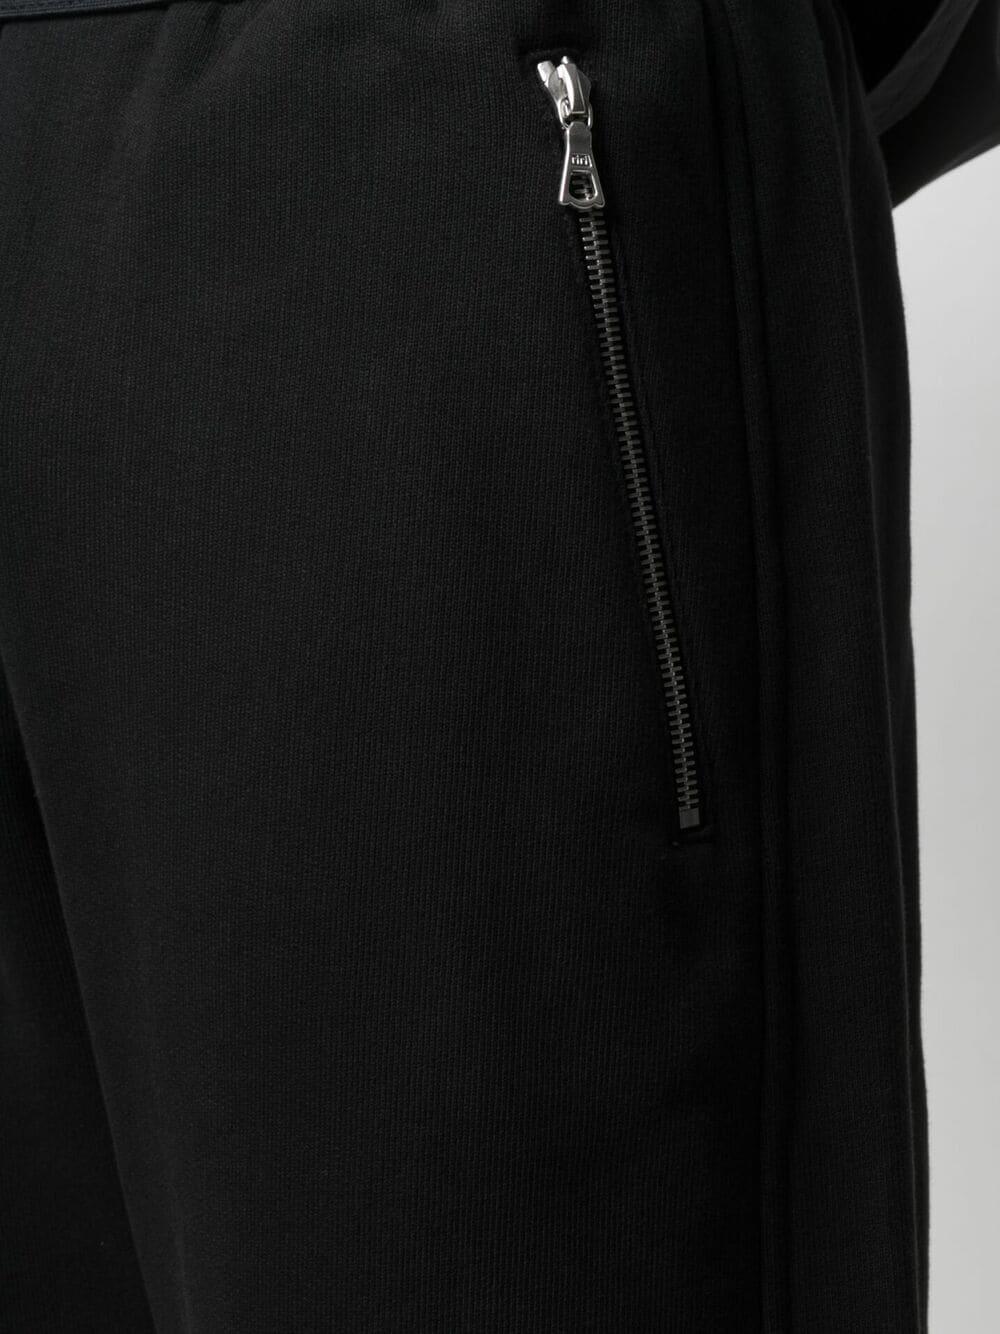 Dries Van Noten pantaloni dal taglio dritto uomo nero DRIES VAN NOTEN | Pantaloni | HASKOS2613BLACK